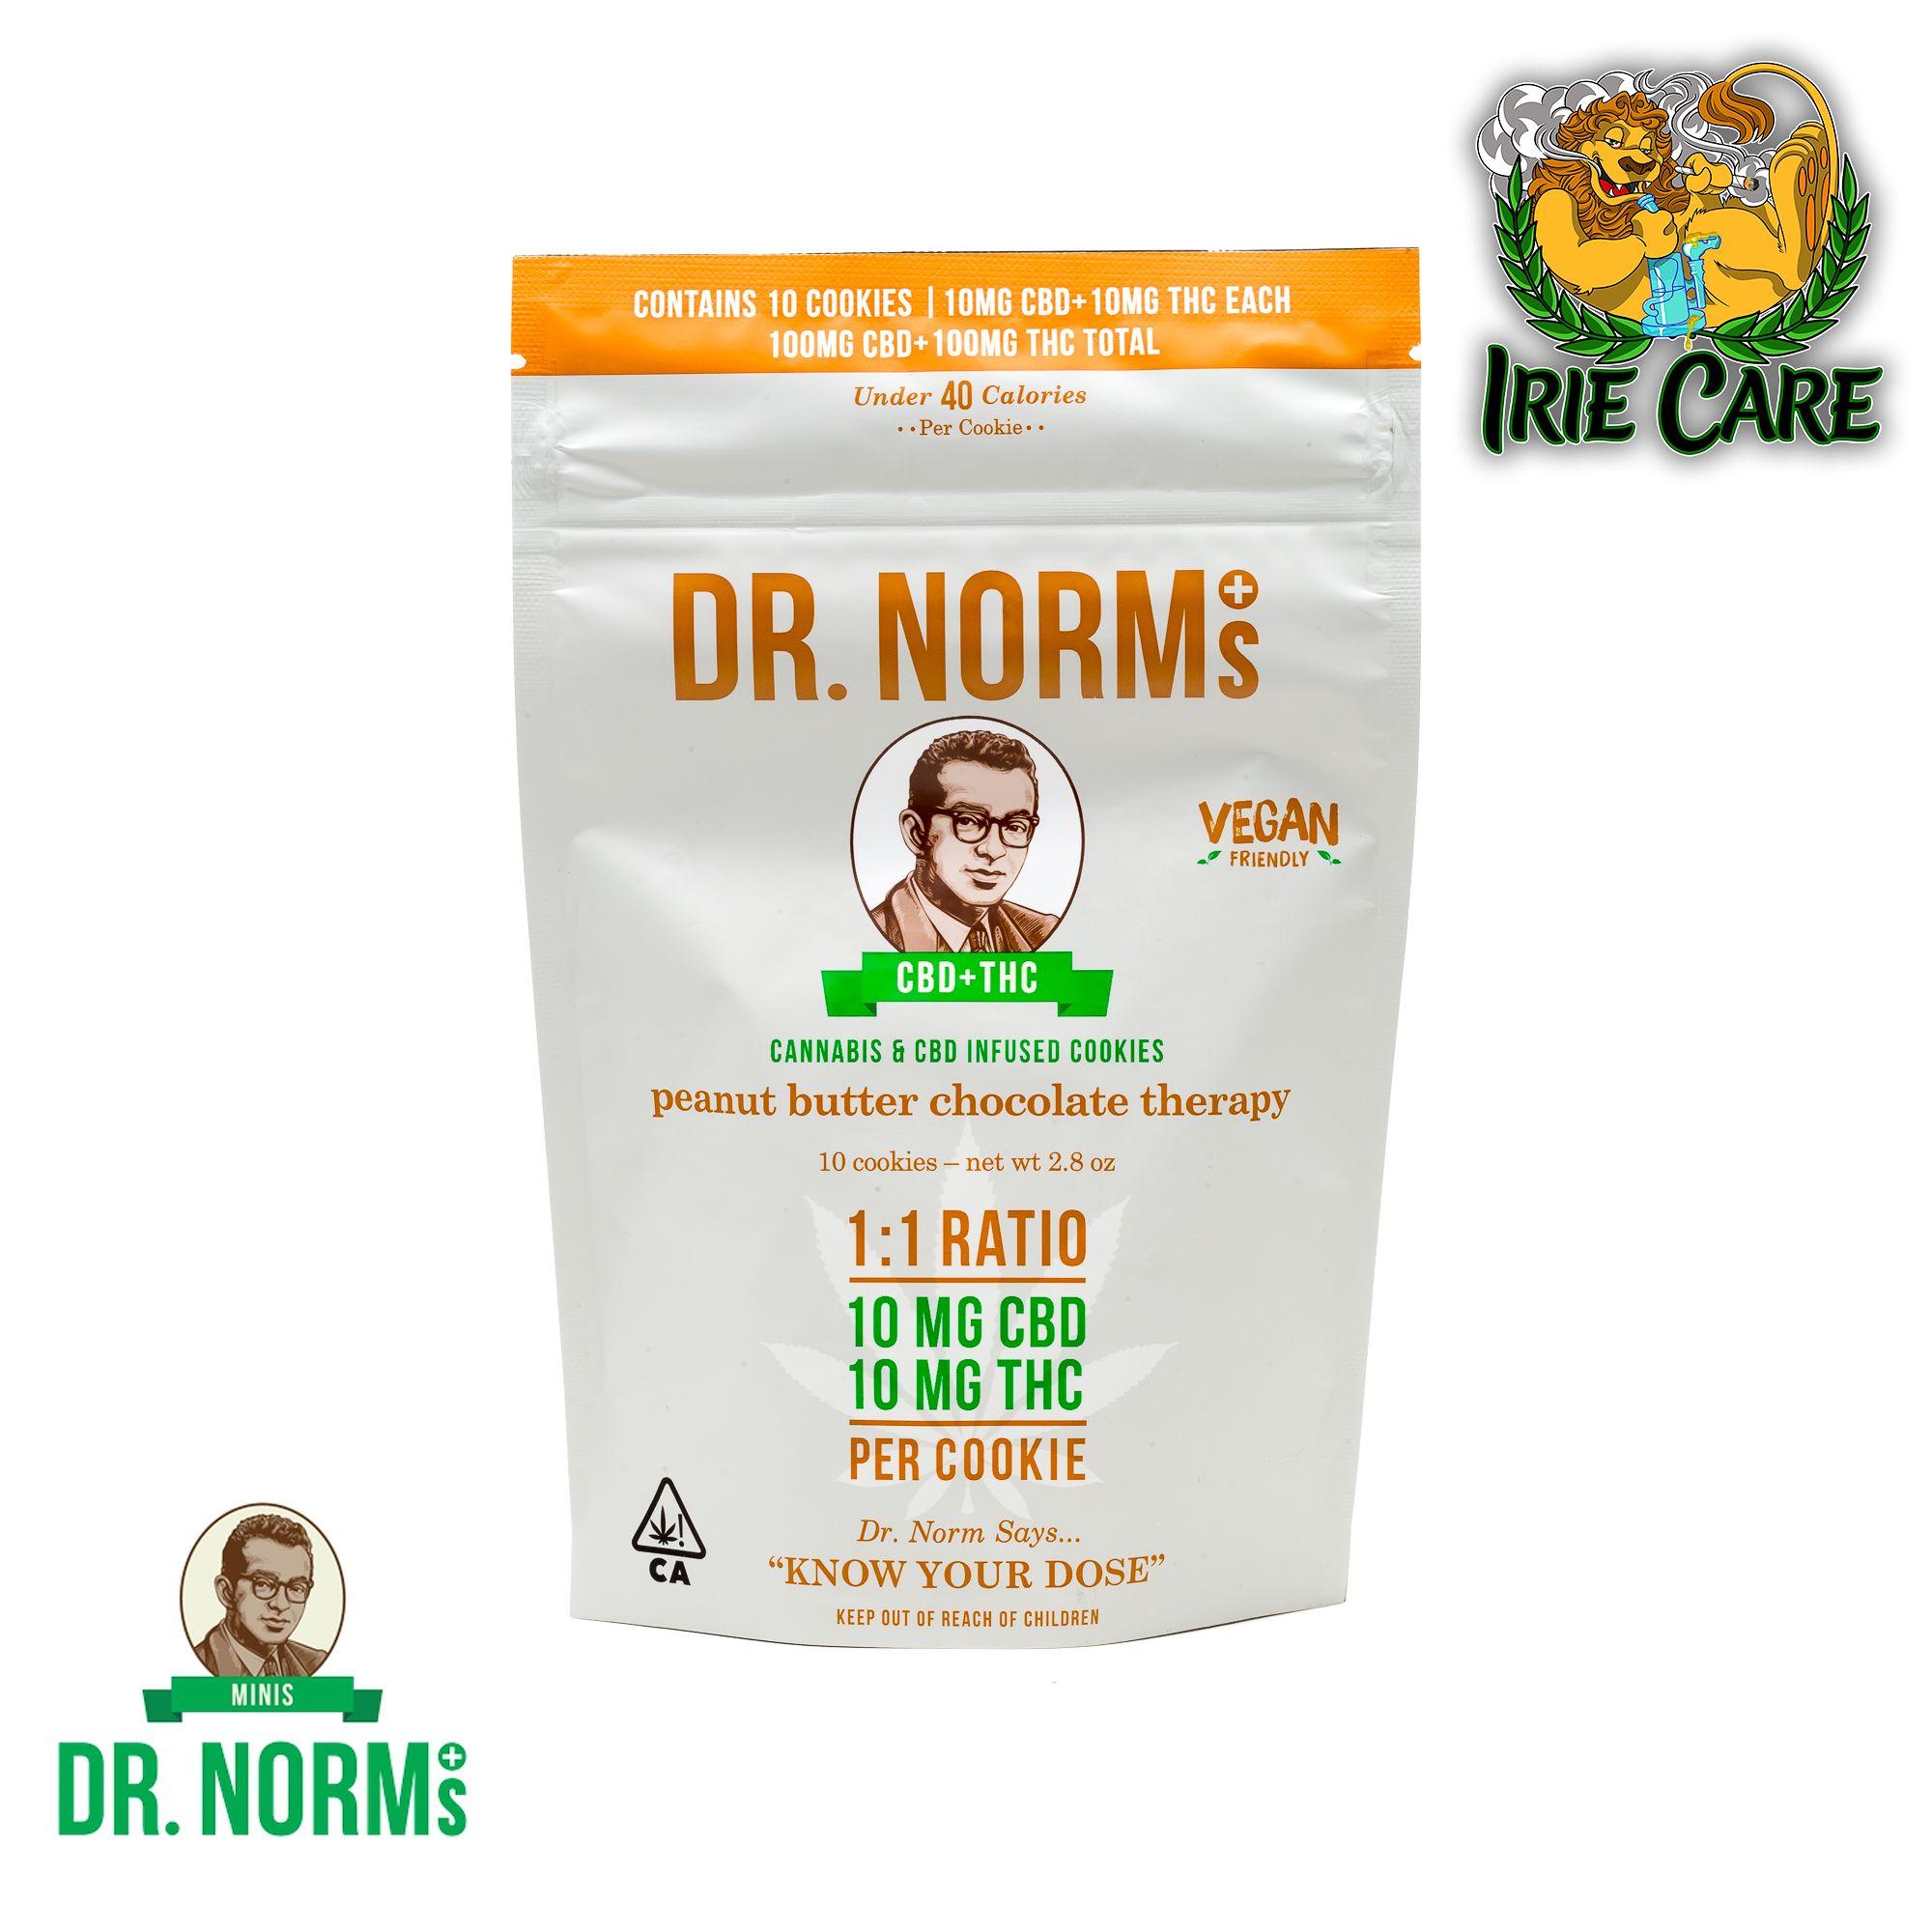 Dr. Norm's Peanut Butter Choc CBD Cookies (10 cookies - 100mg CBD/100mg THC)